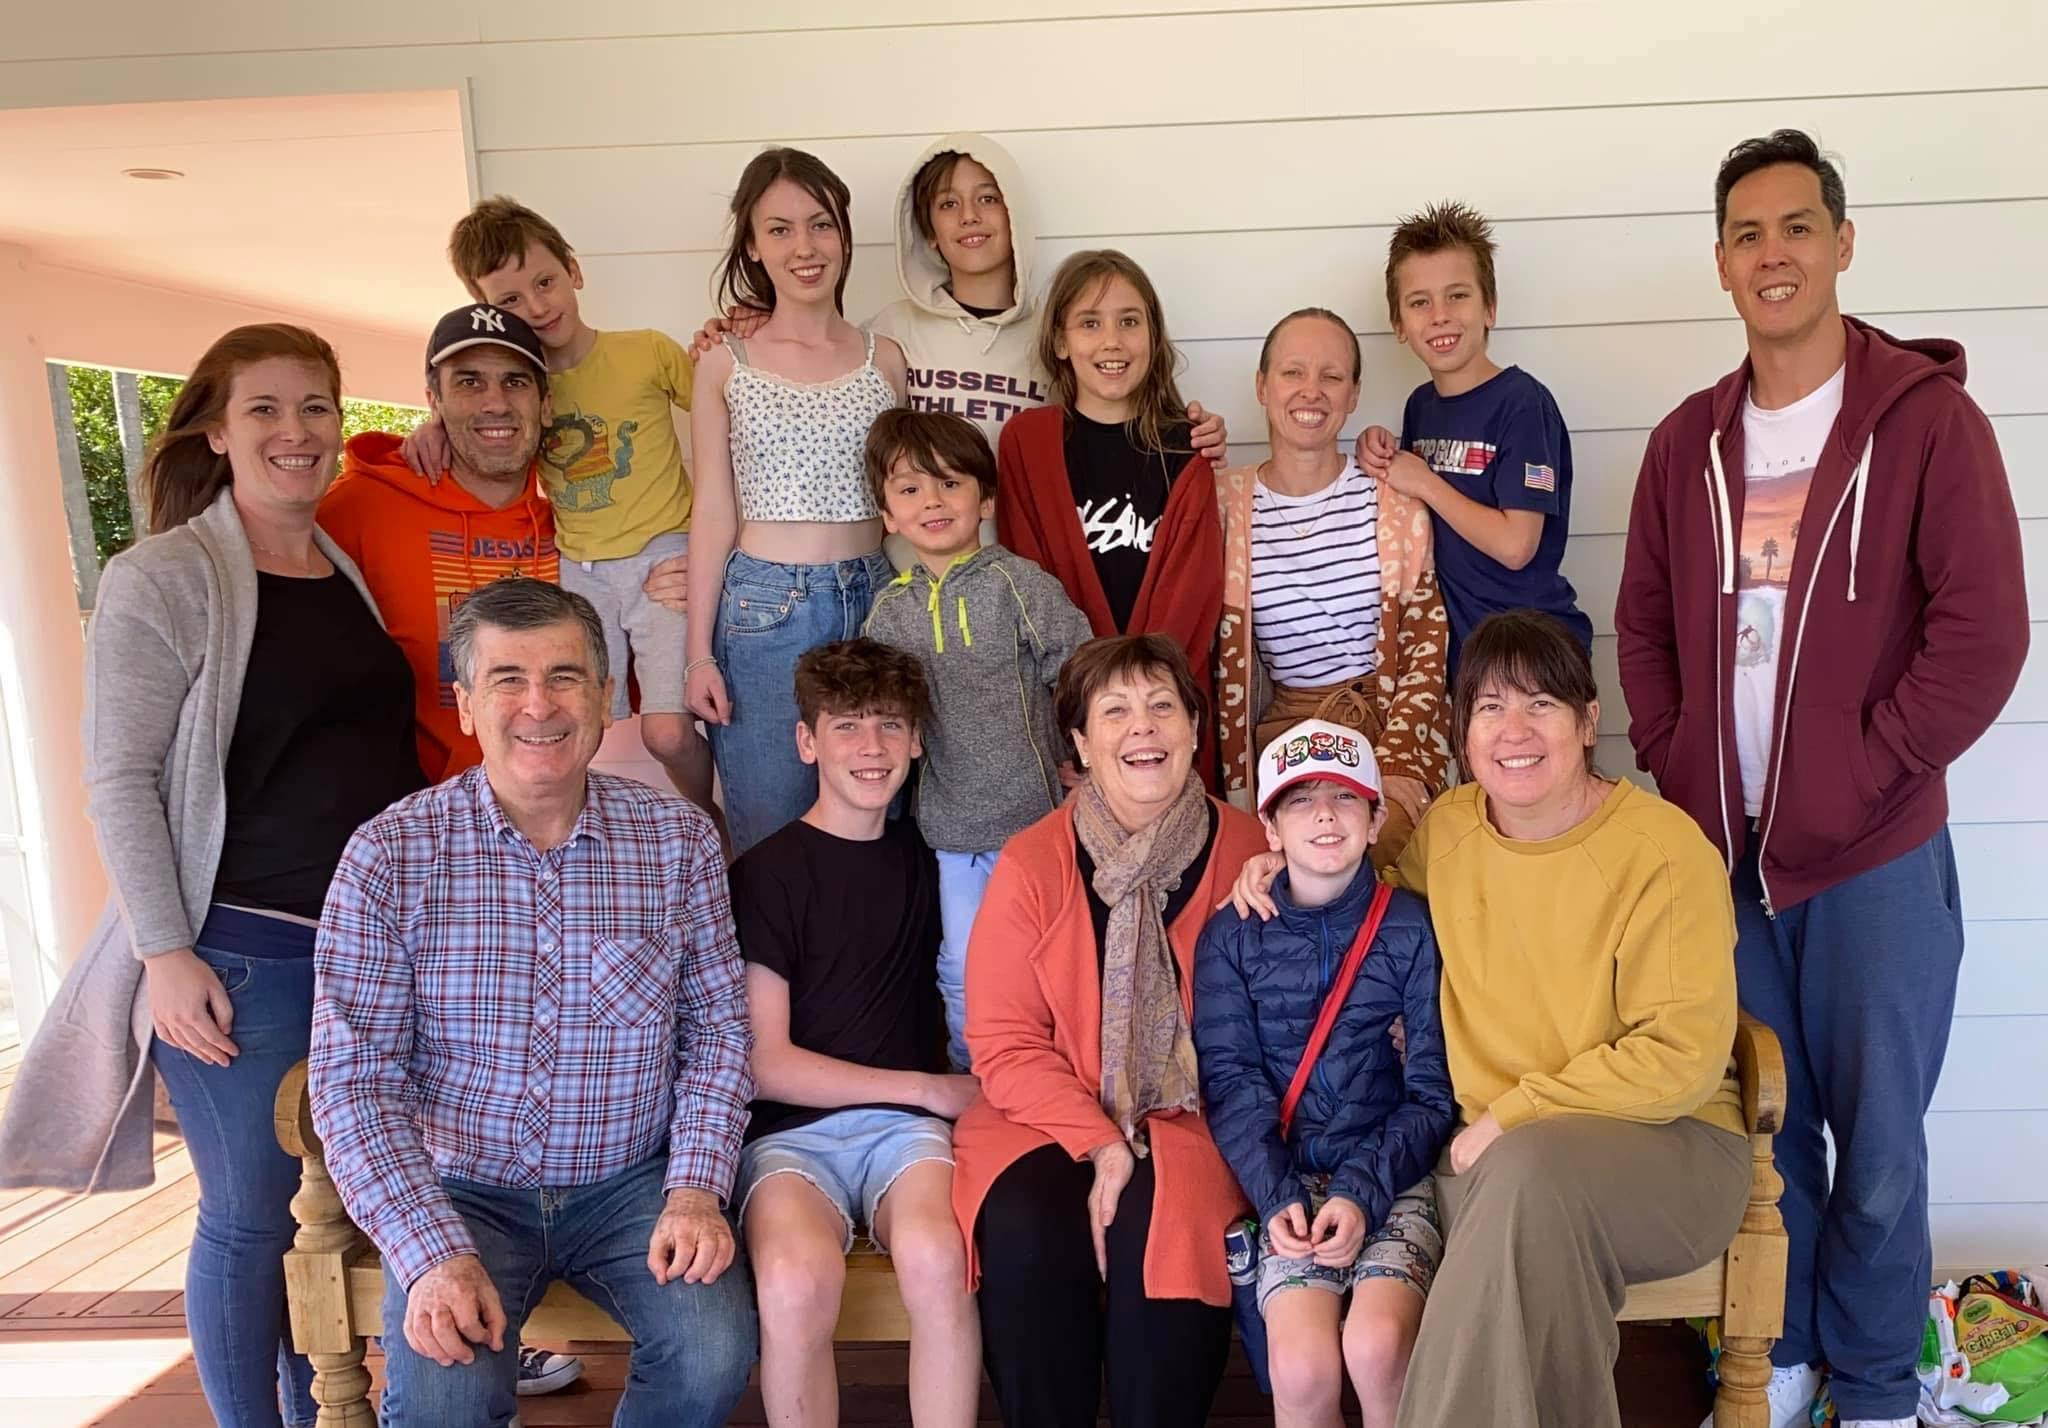 Dr Sykes Family Photo